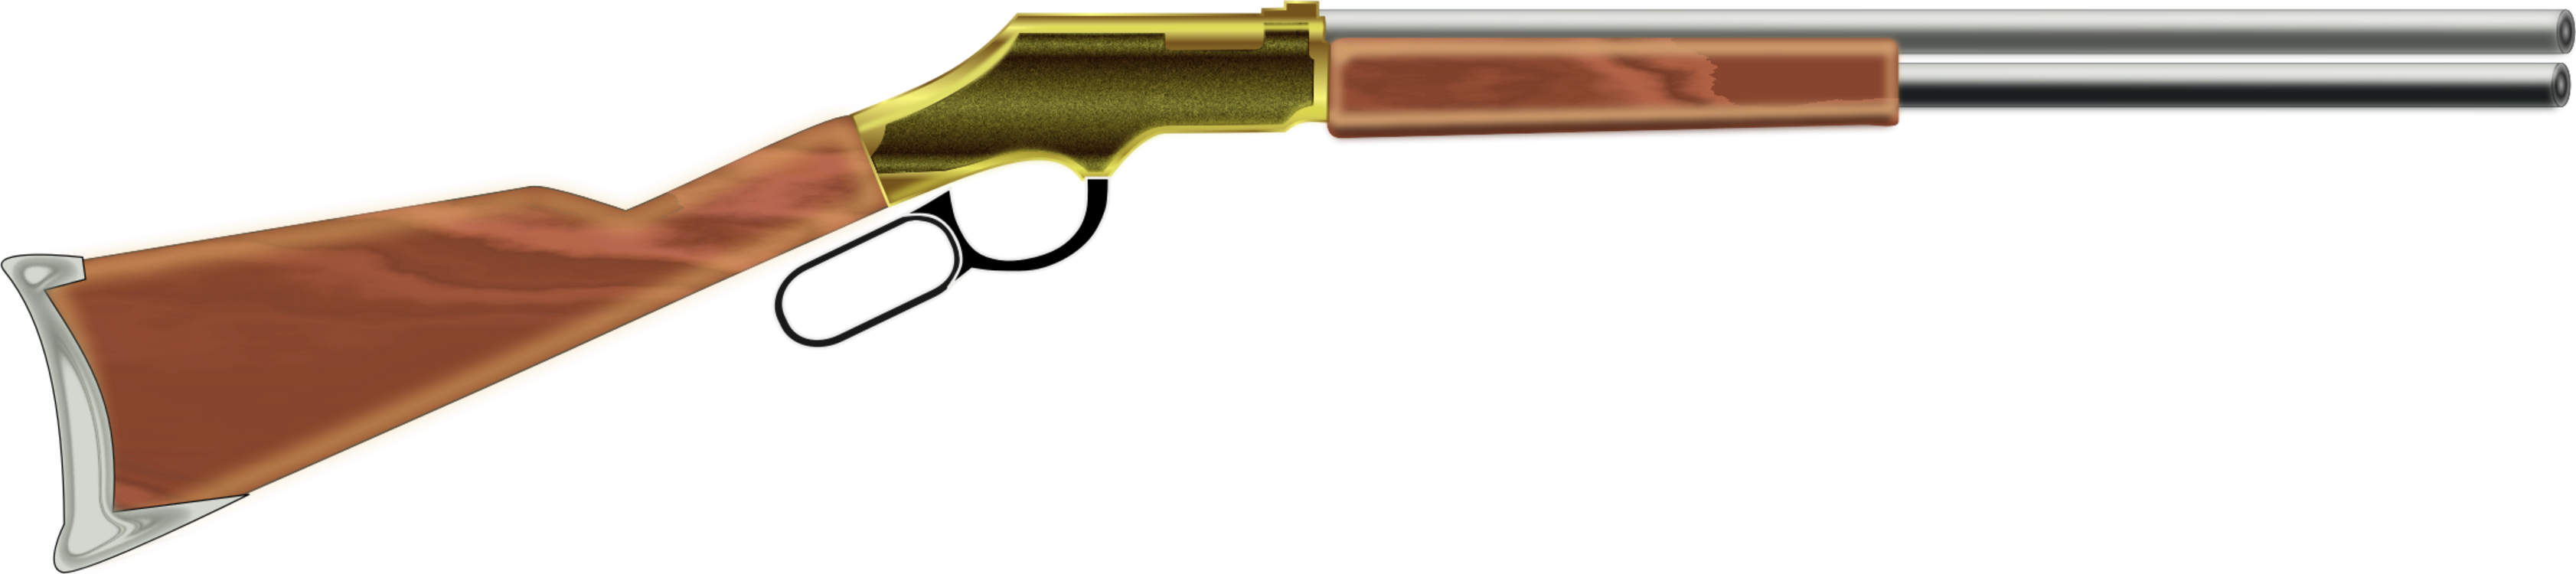 Gun Accessory,Gun Barrel,Shotgun